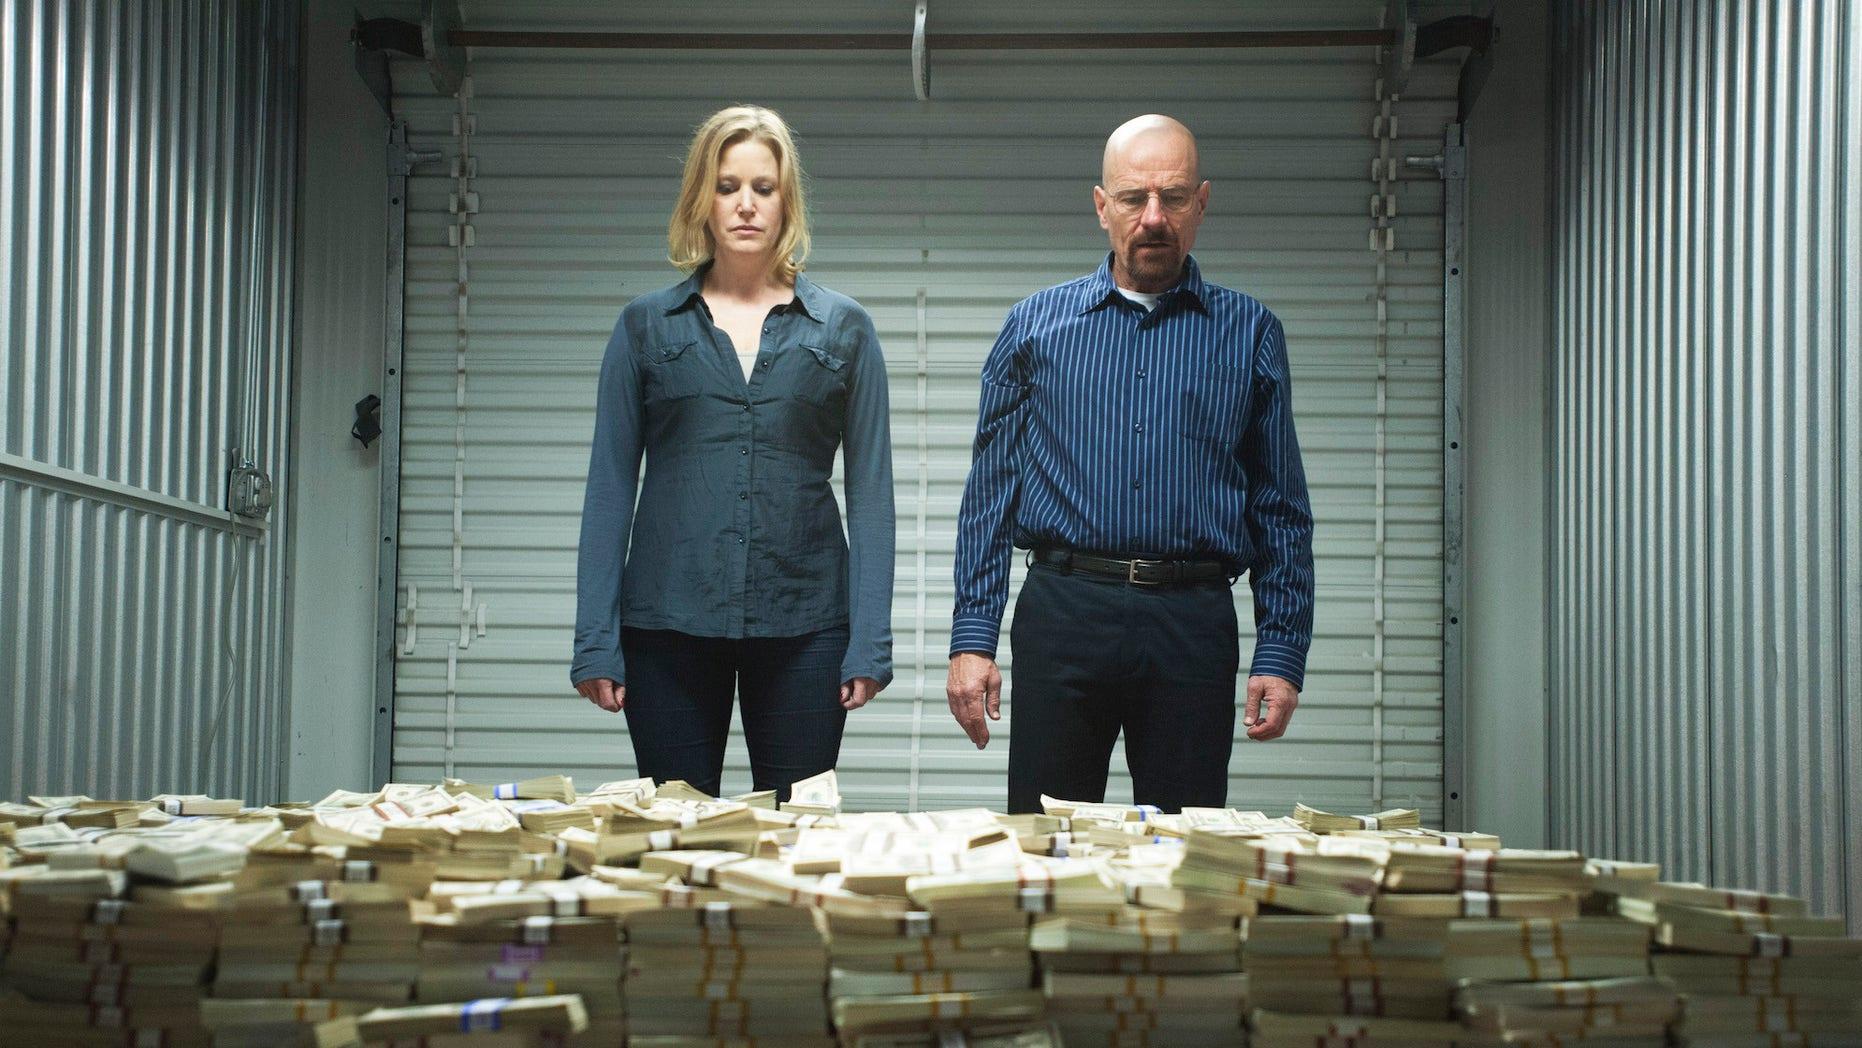 Skyler White (Anna Gunn) and Walter White (Bryan Cranston) in Breaking Bad, Season 5, Episode 8. Photo Credit: Lewis Jacobs/AMC.